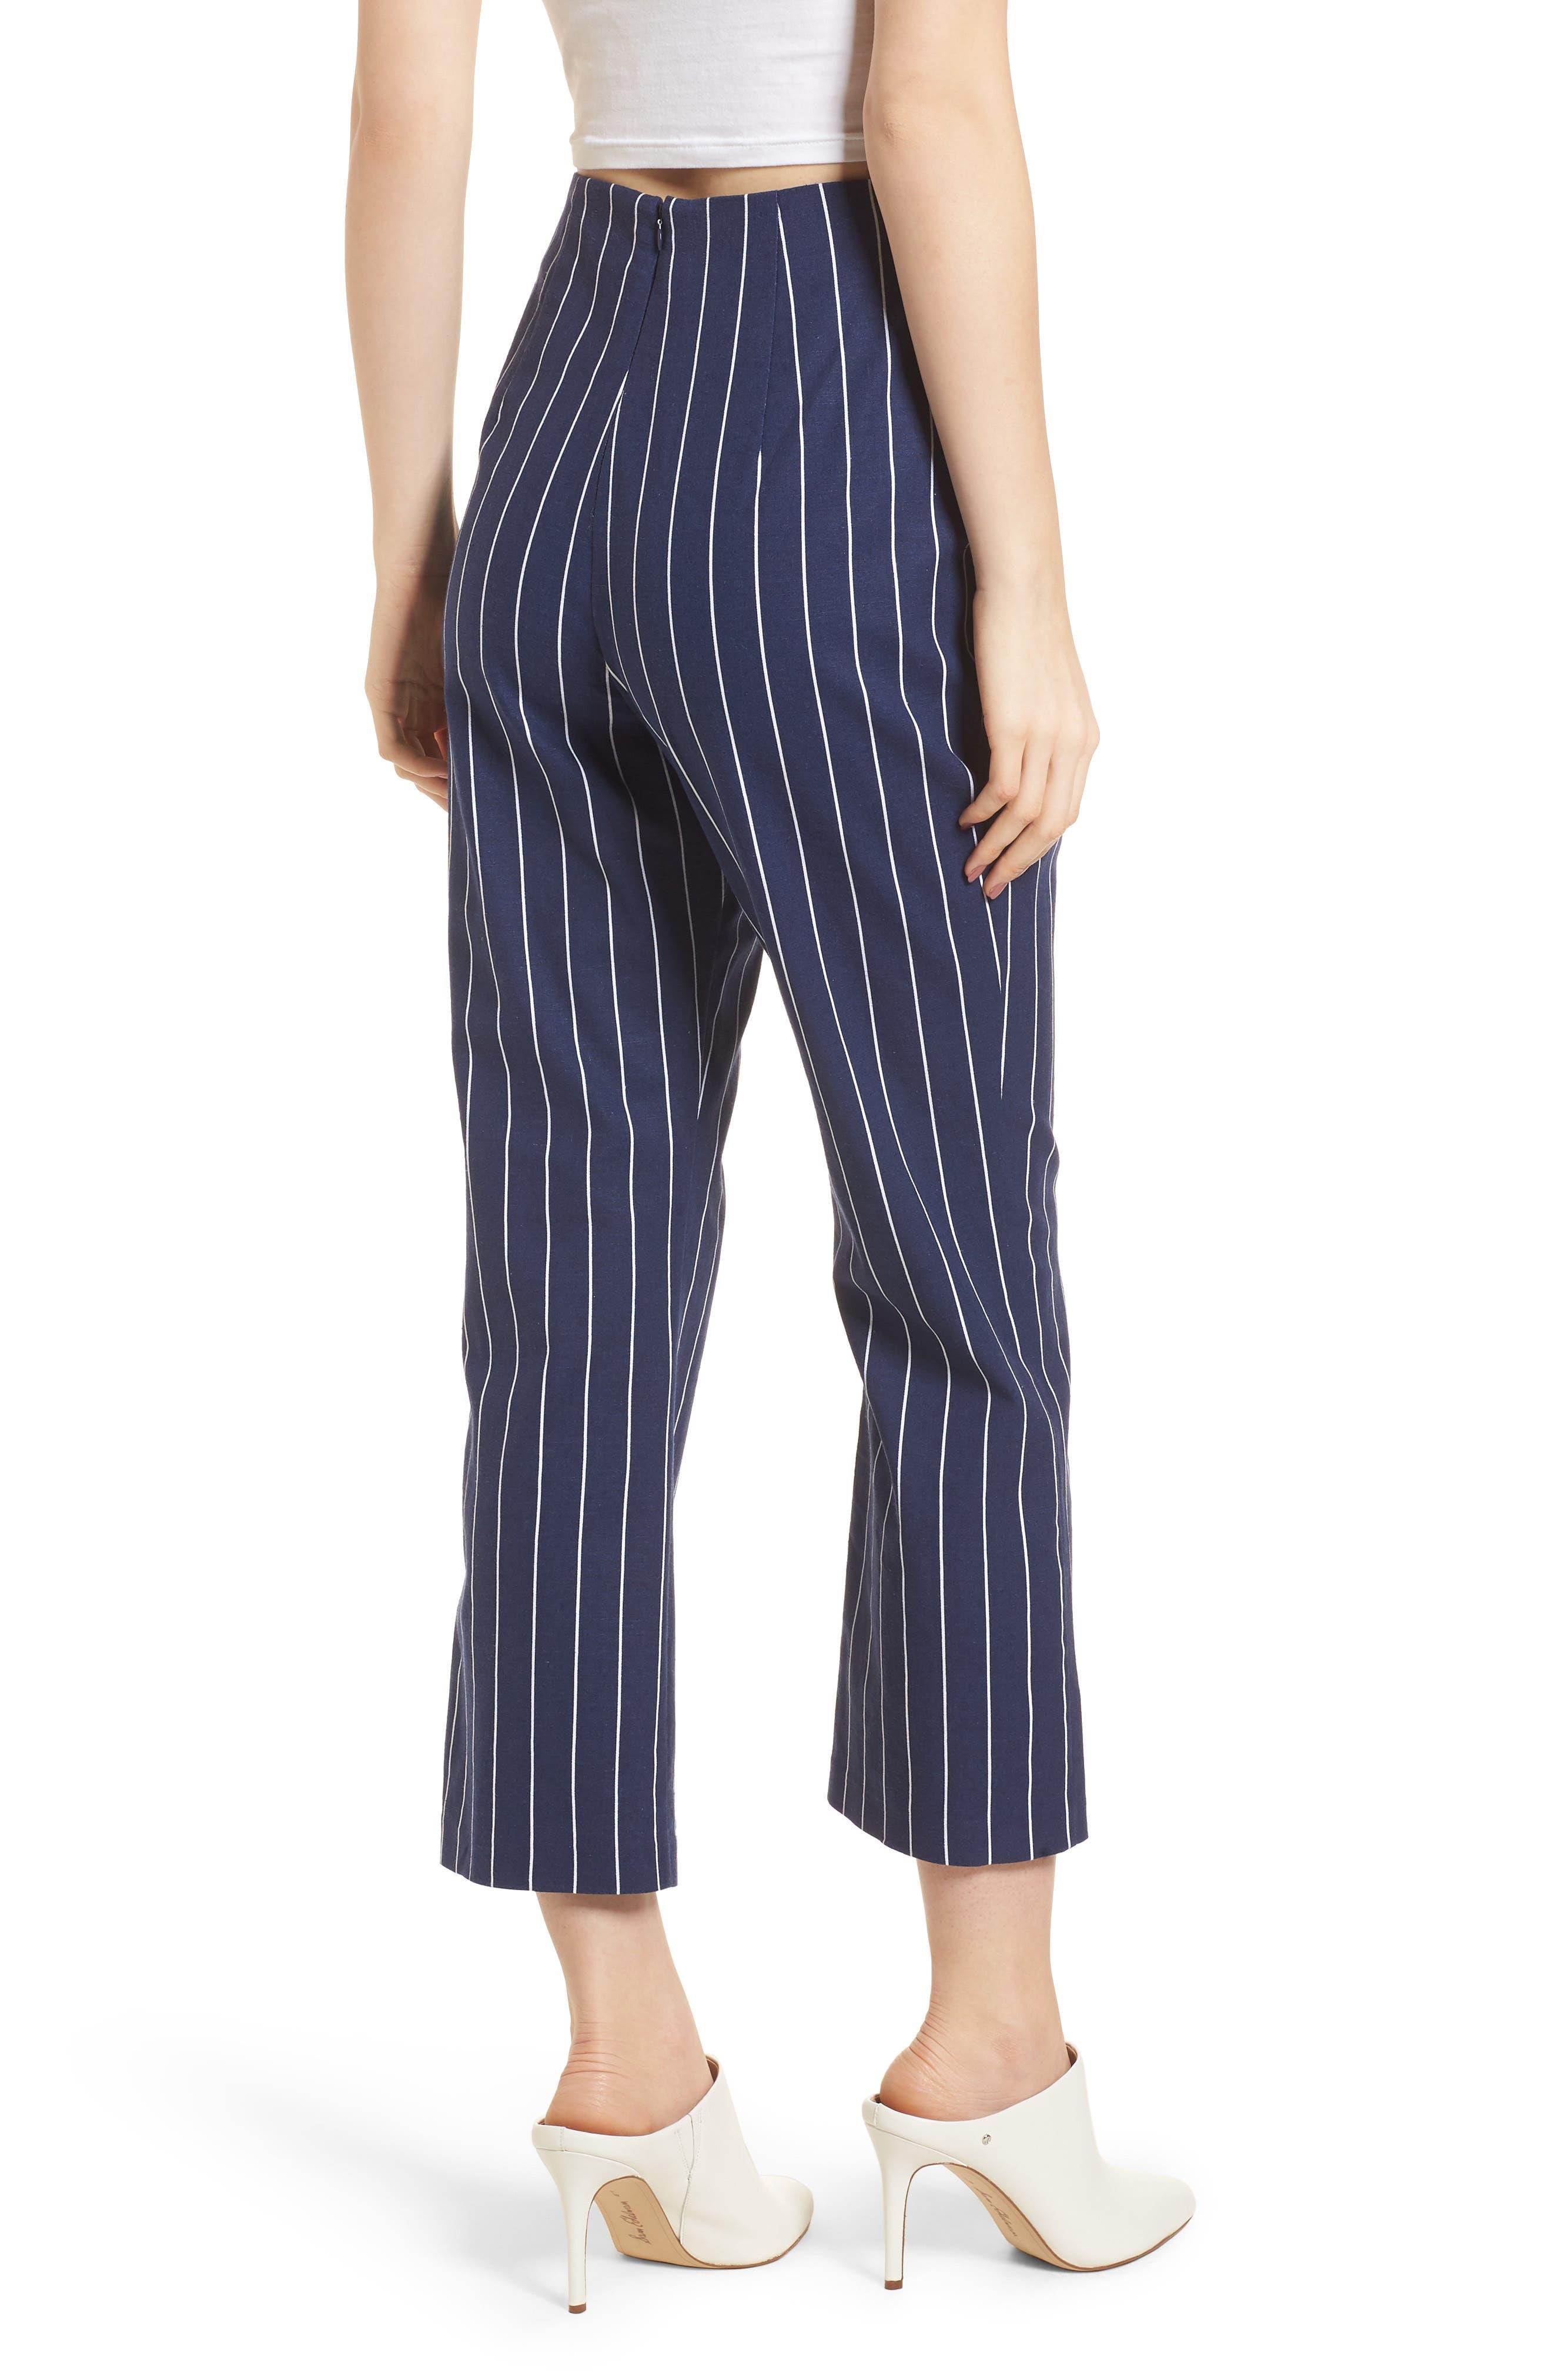 WAYF, Pisa High Waist Crop Pants, Alternate thumbnail 2, color, 400